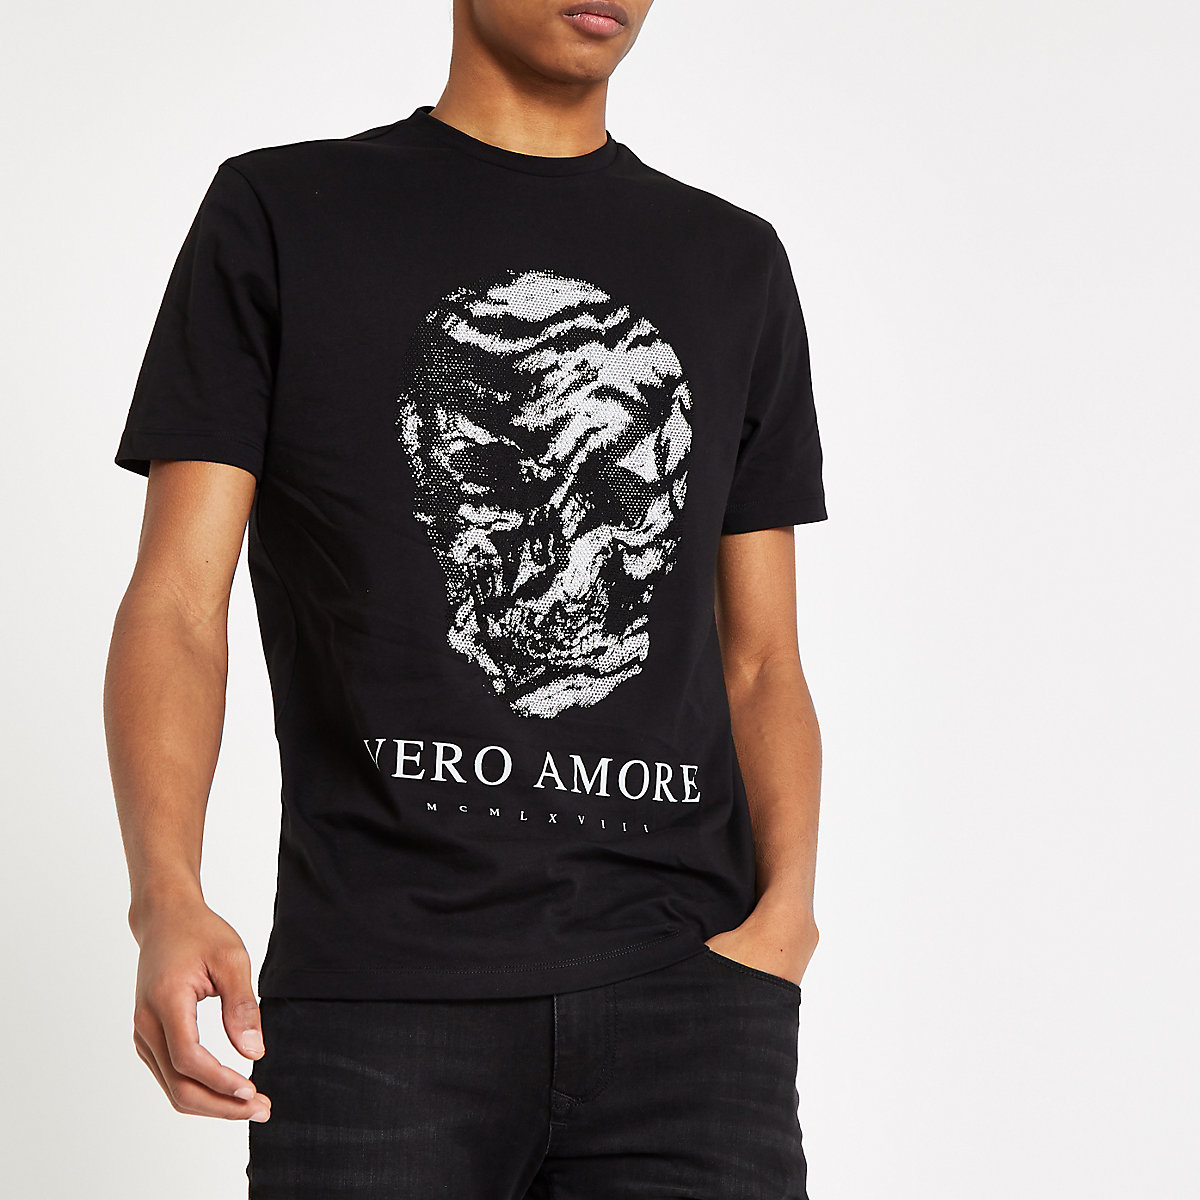 Black 'Vero amore' skull slim fit T-shirt